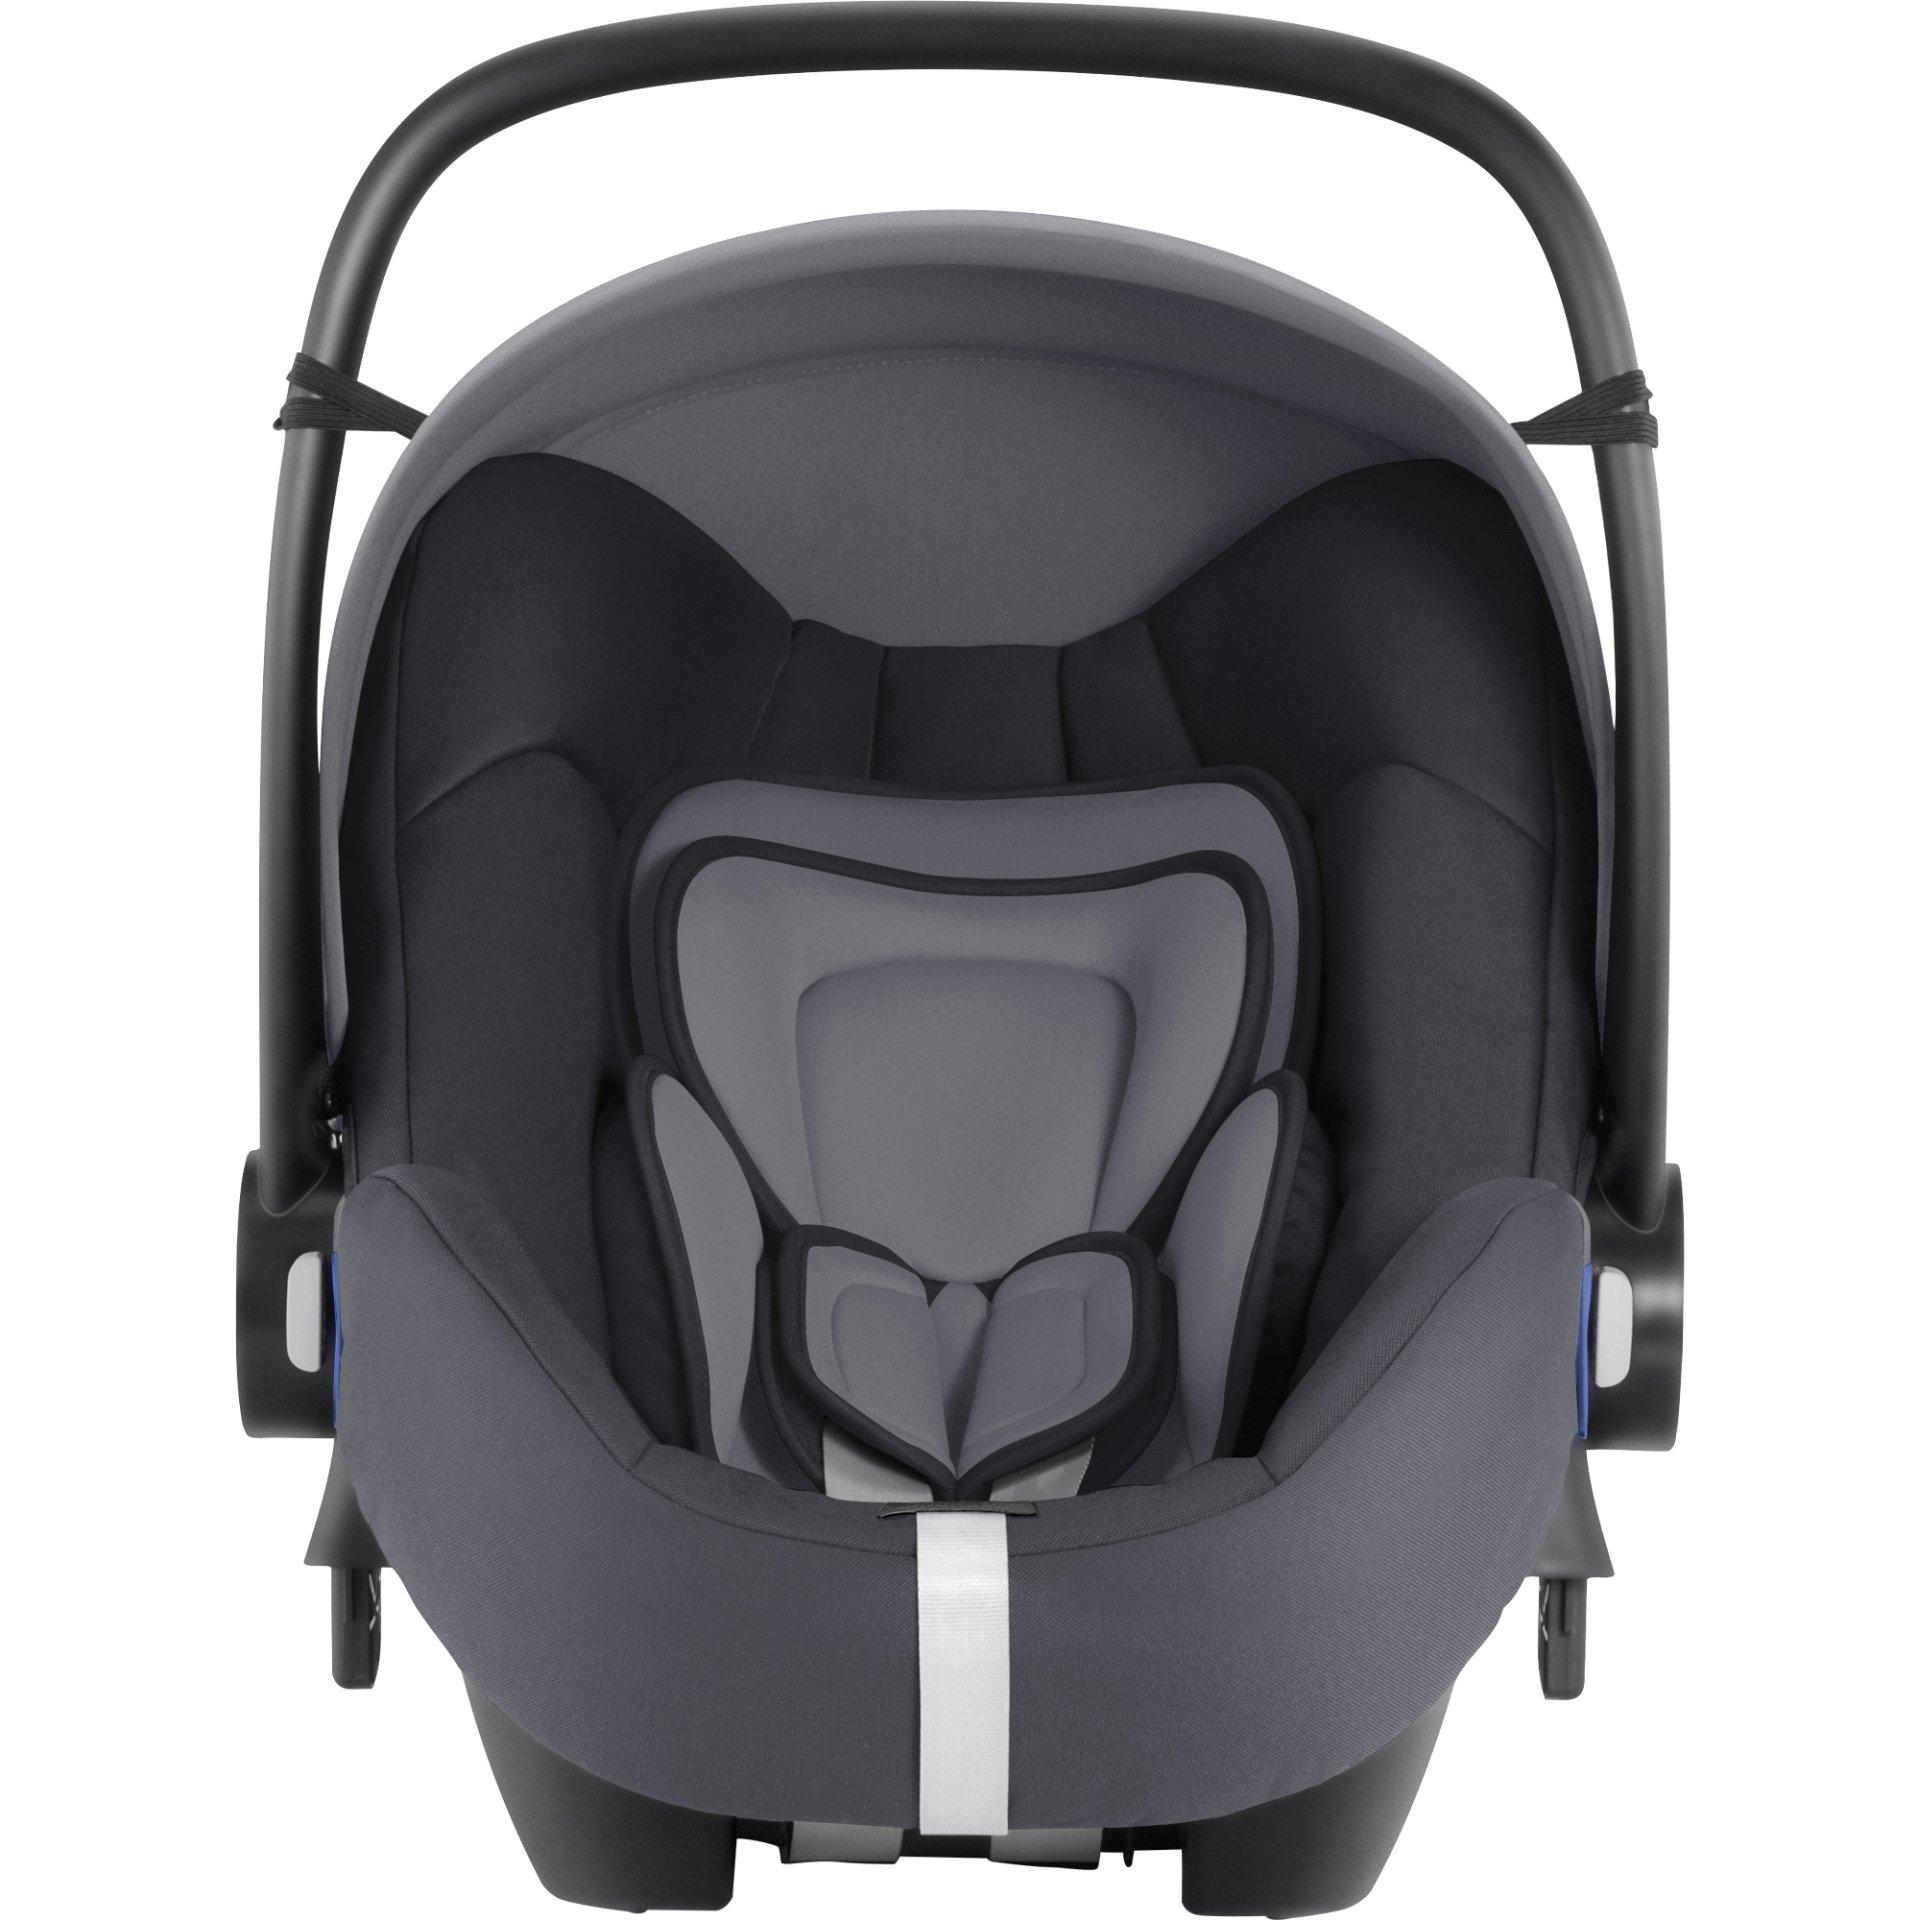 Britax Römer 嬰兒提籃 Baby Safe 2 i-Size 含i-Size底座 Storm Grey   kids-room.com